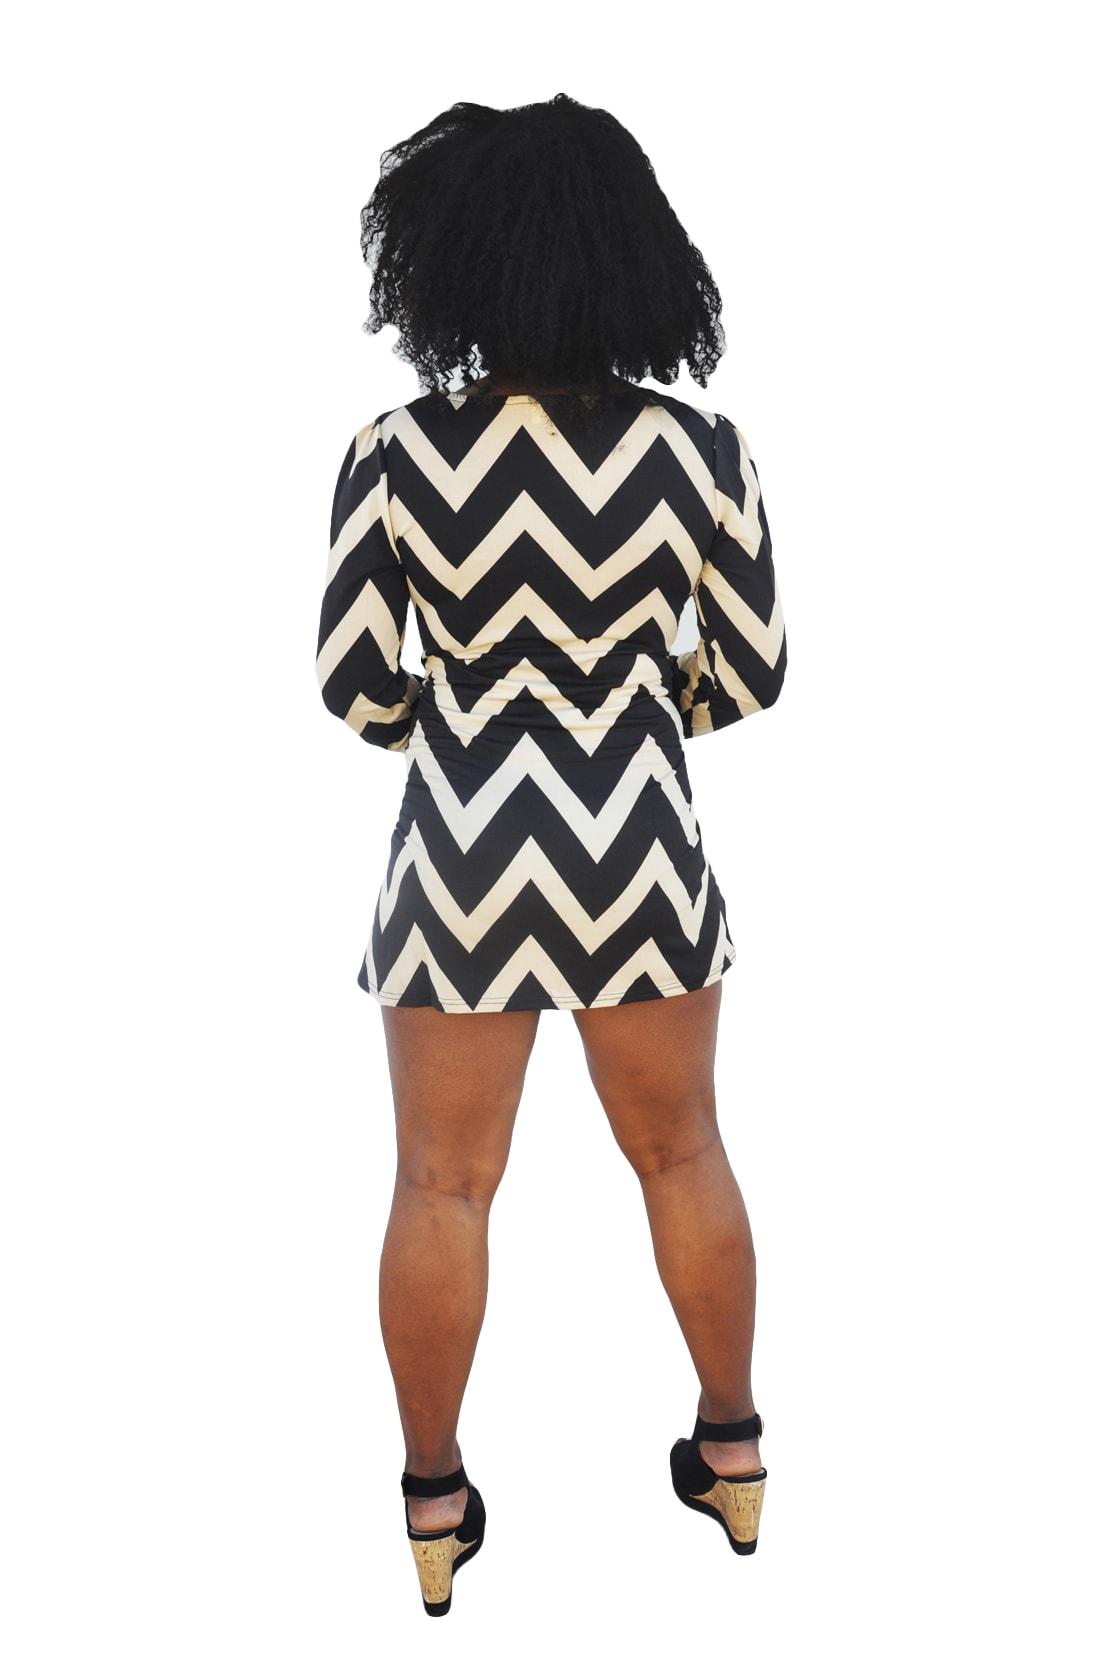 M0248 khaki3 Midi Medium Dresses maureens.com boutique